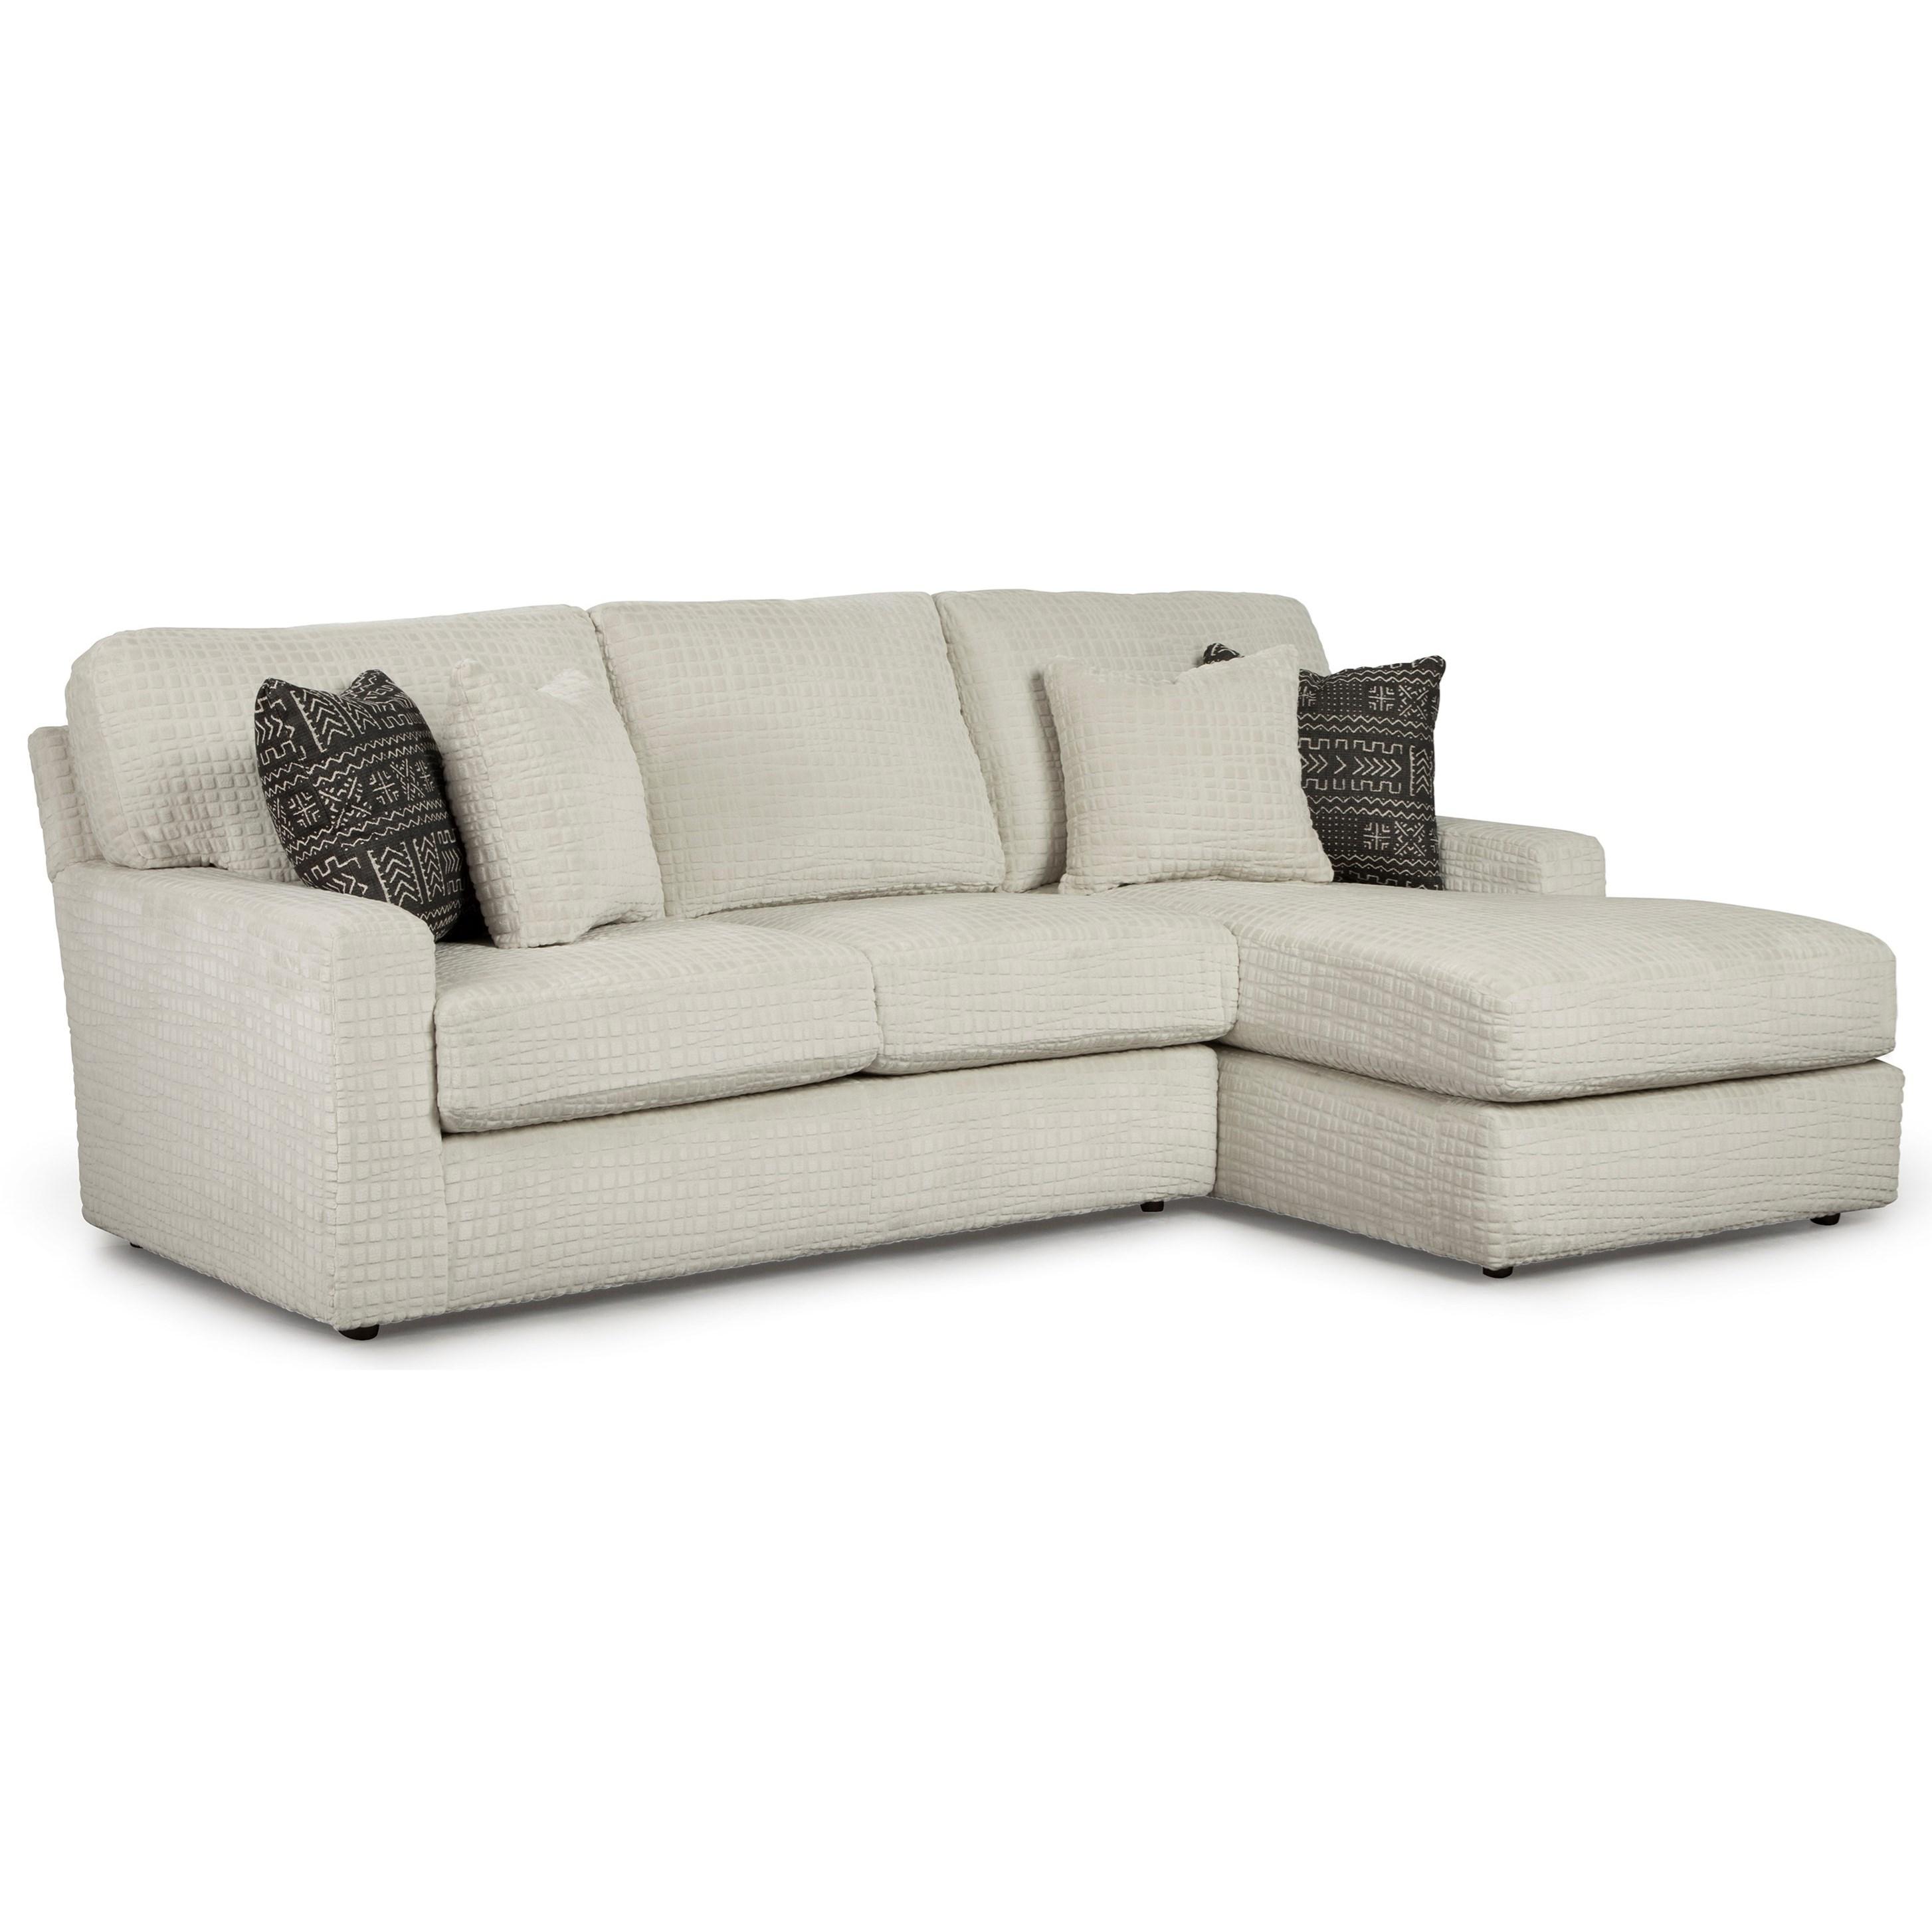 2 Piece Sectional Sofa w/ RAF Chaise